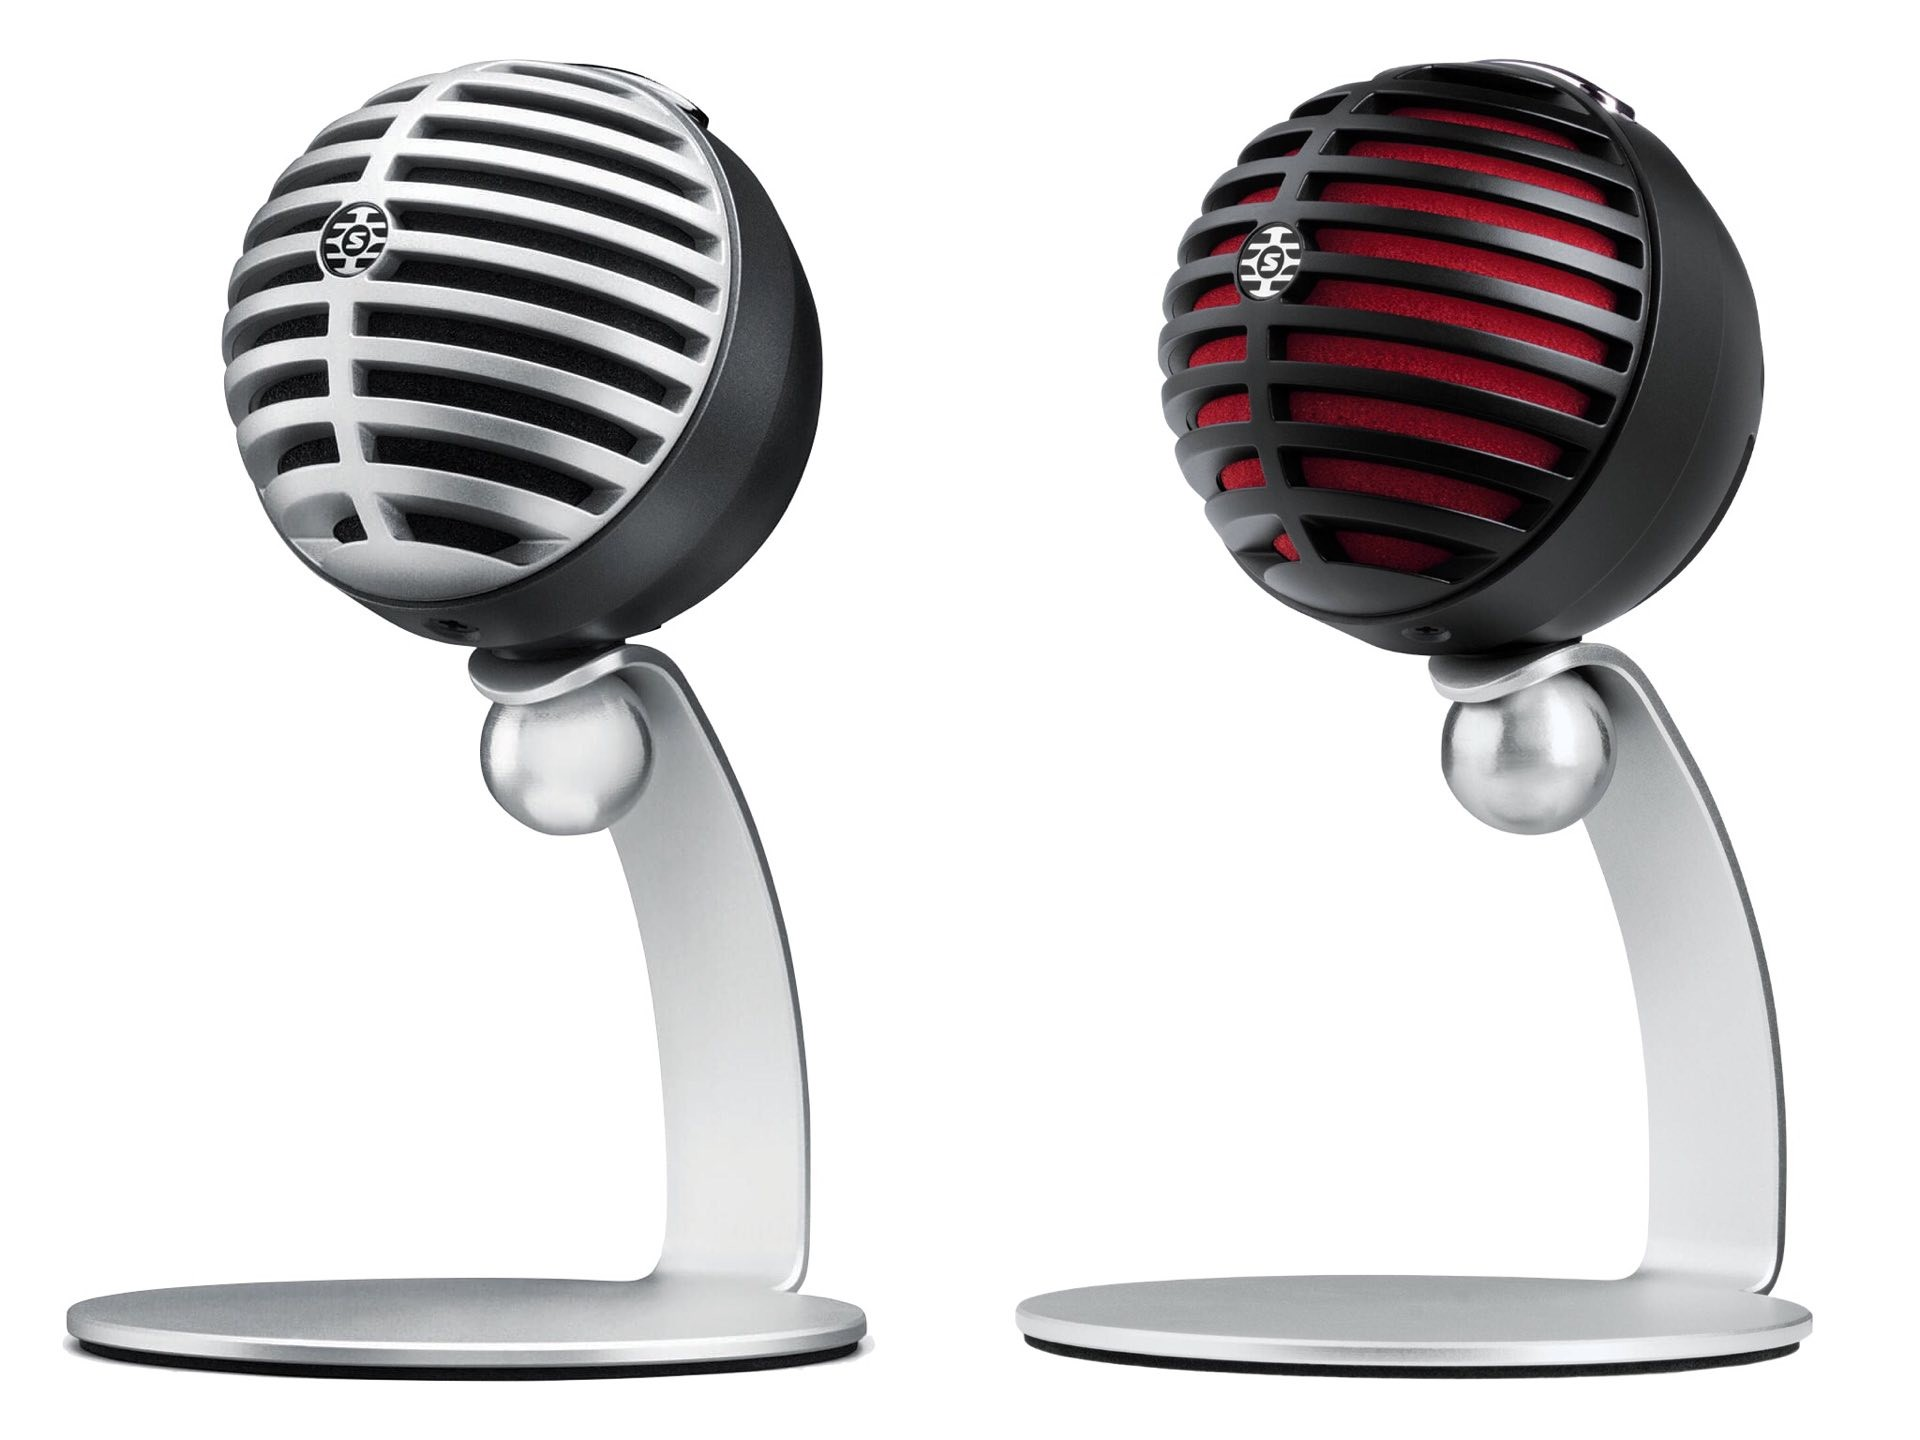 Shure MV5 digital condenser mic. ($79)